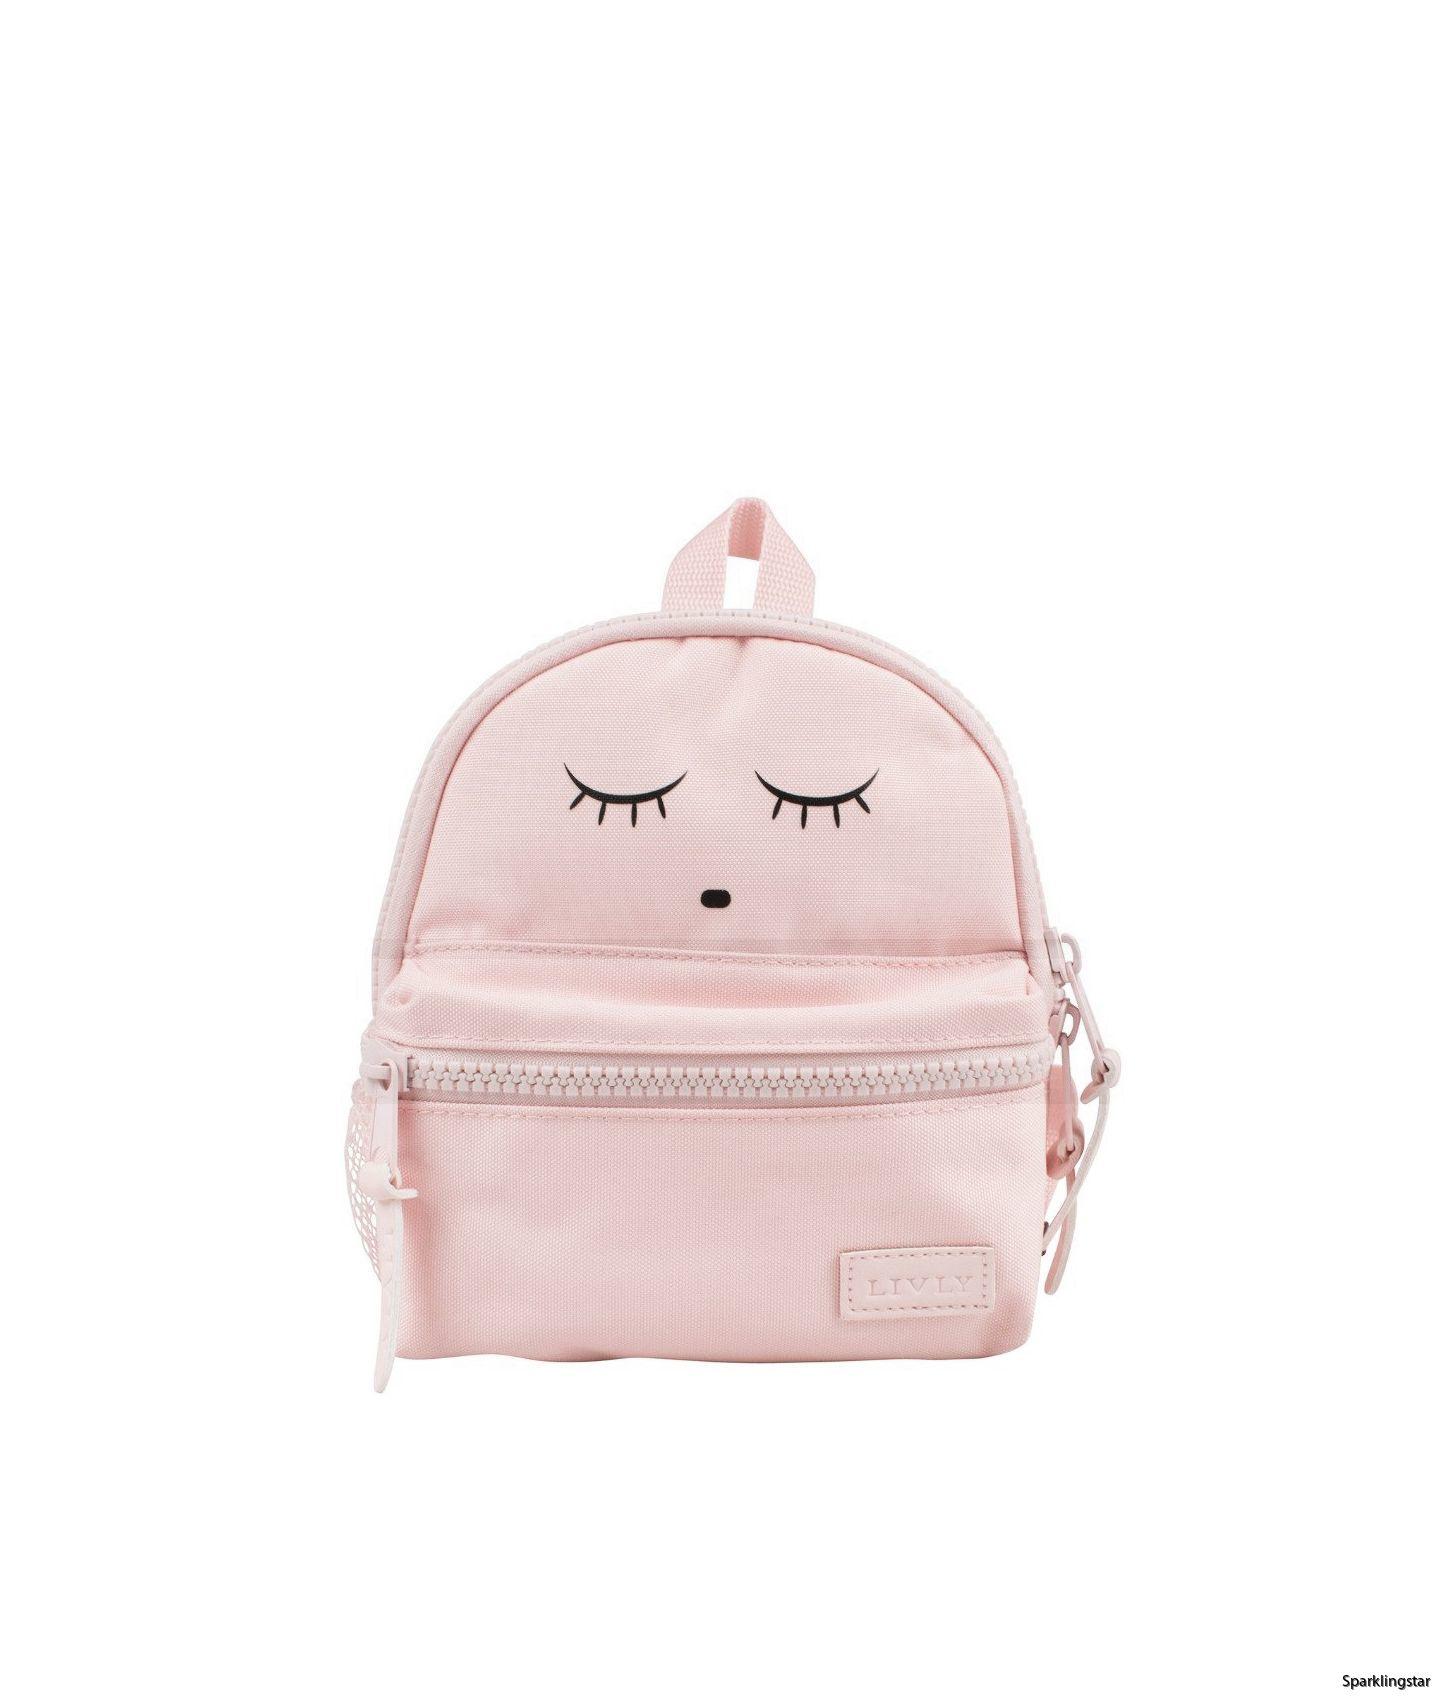 Livly Backpack Pink Sleeping Cutie ( Mini)